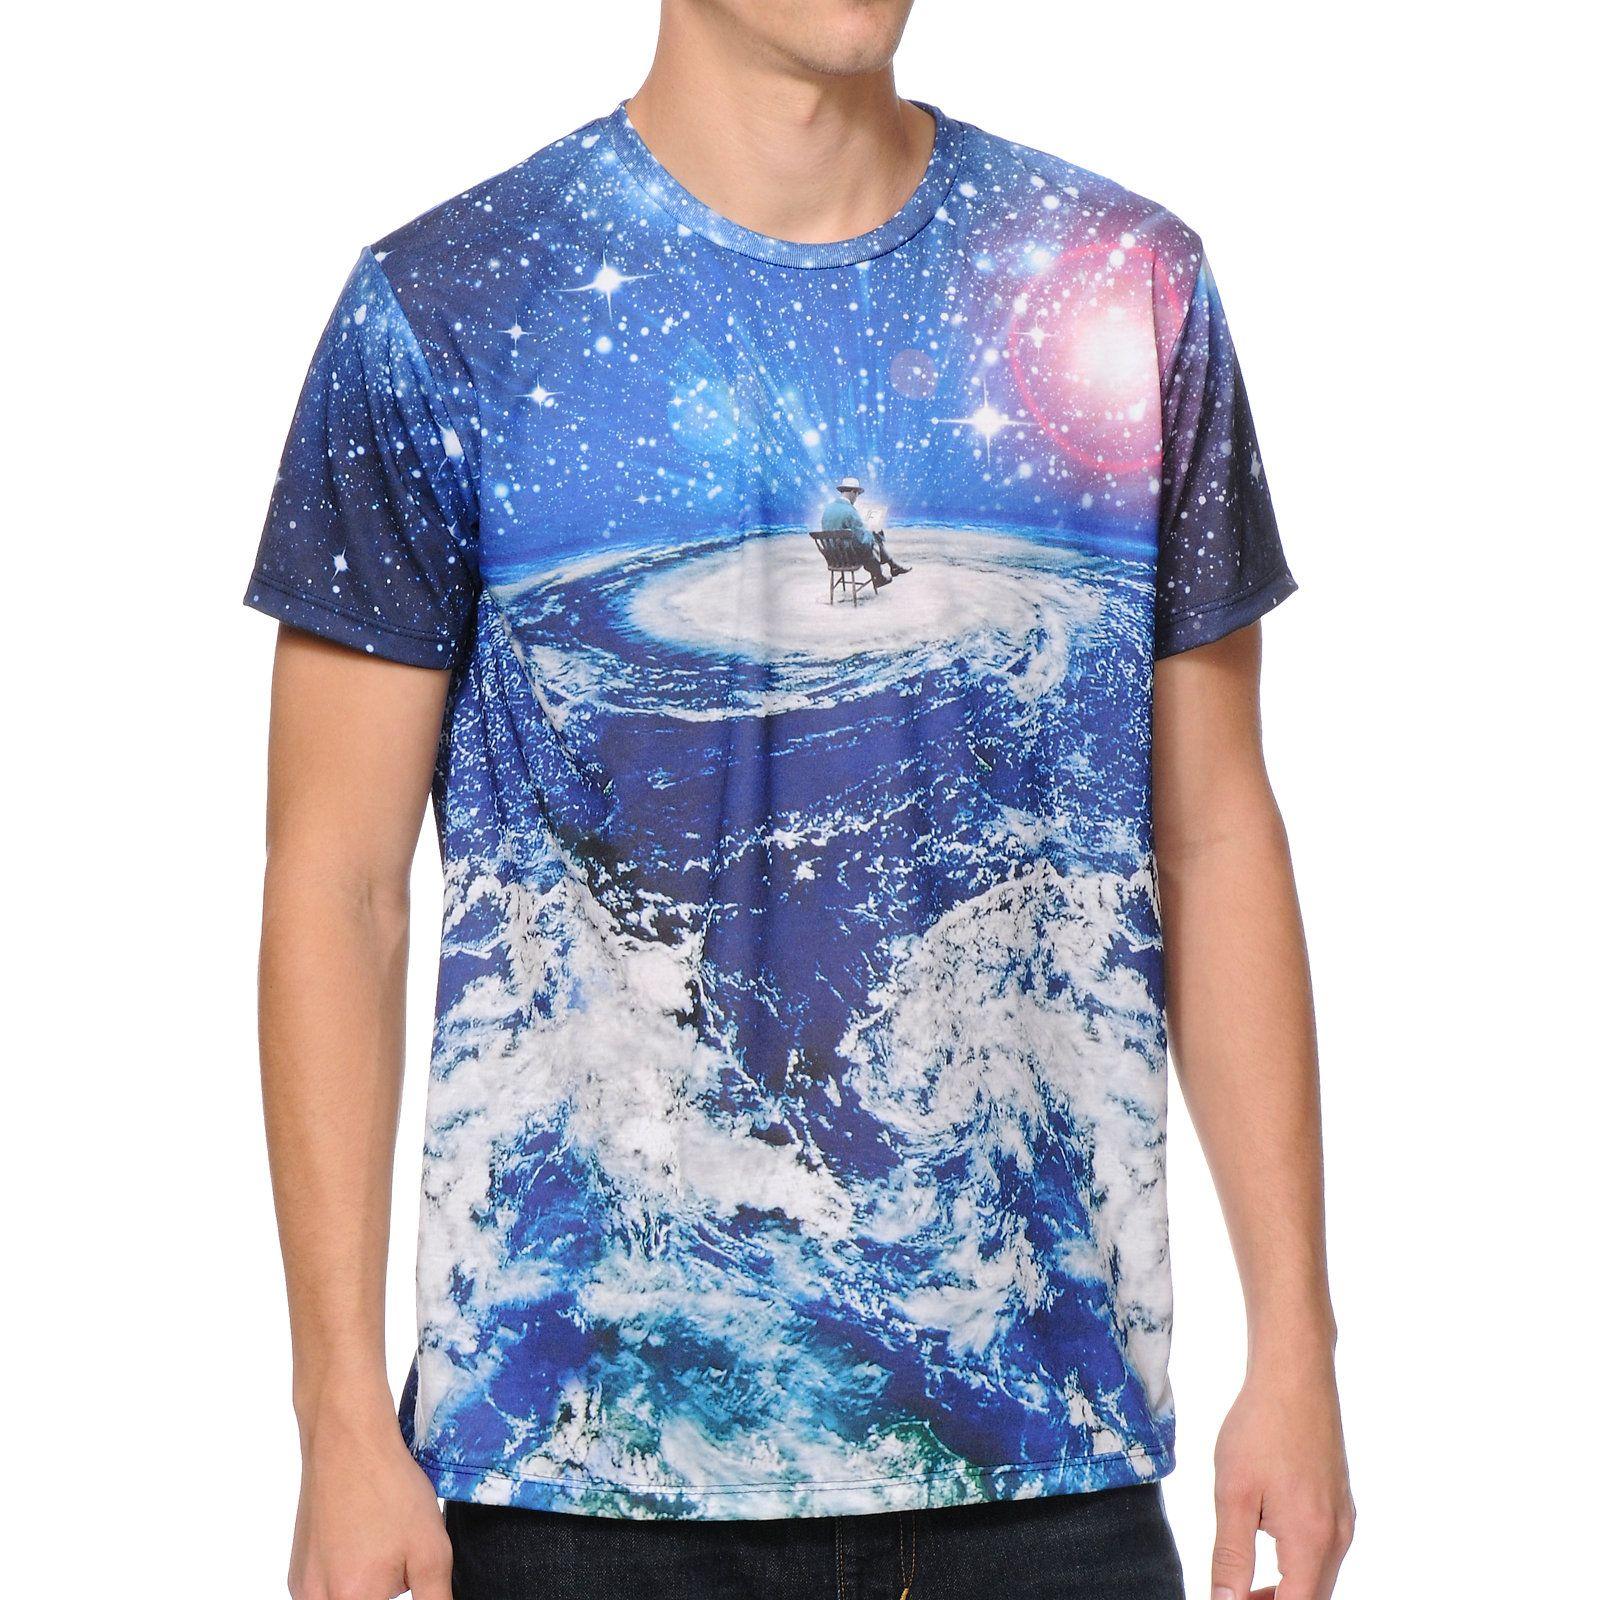 8cda1a2f Wholesale sublimation print t shirts | Wholesale T Shirts Bangladesh ...